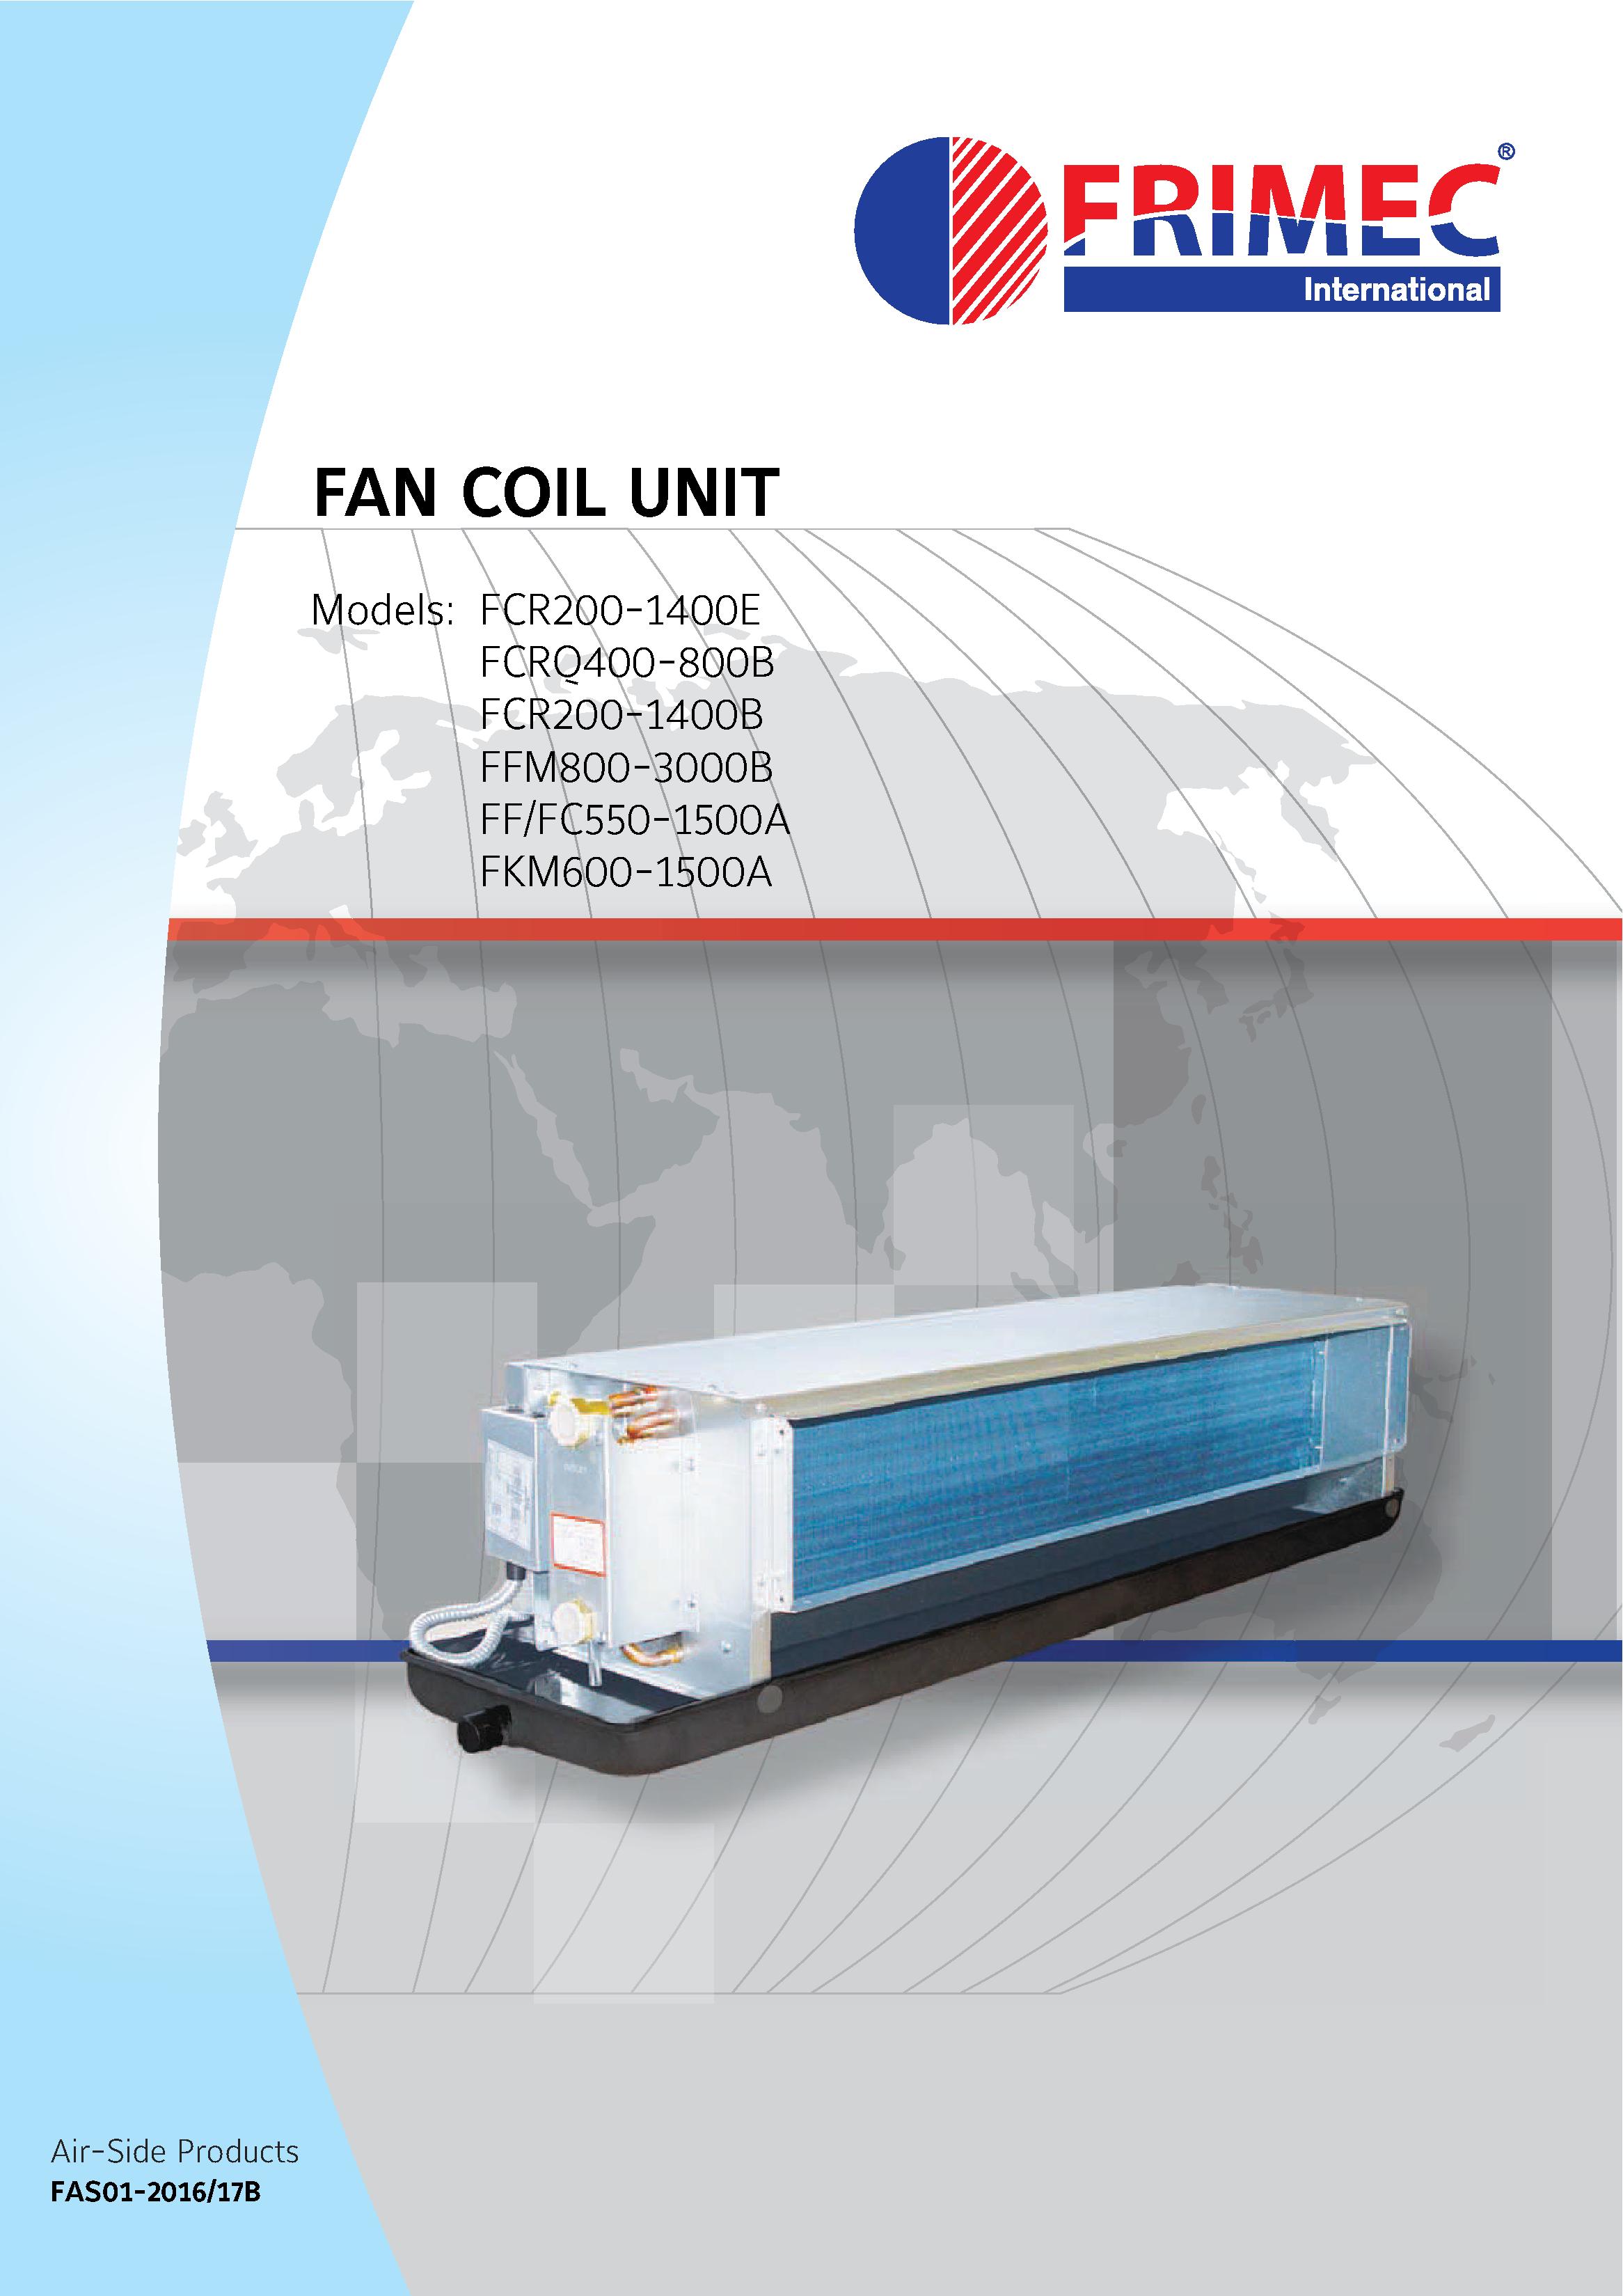 Air Conditioner Fan Coil Unit Frimec capacity 2 Hp 6 HP